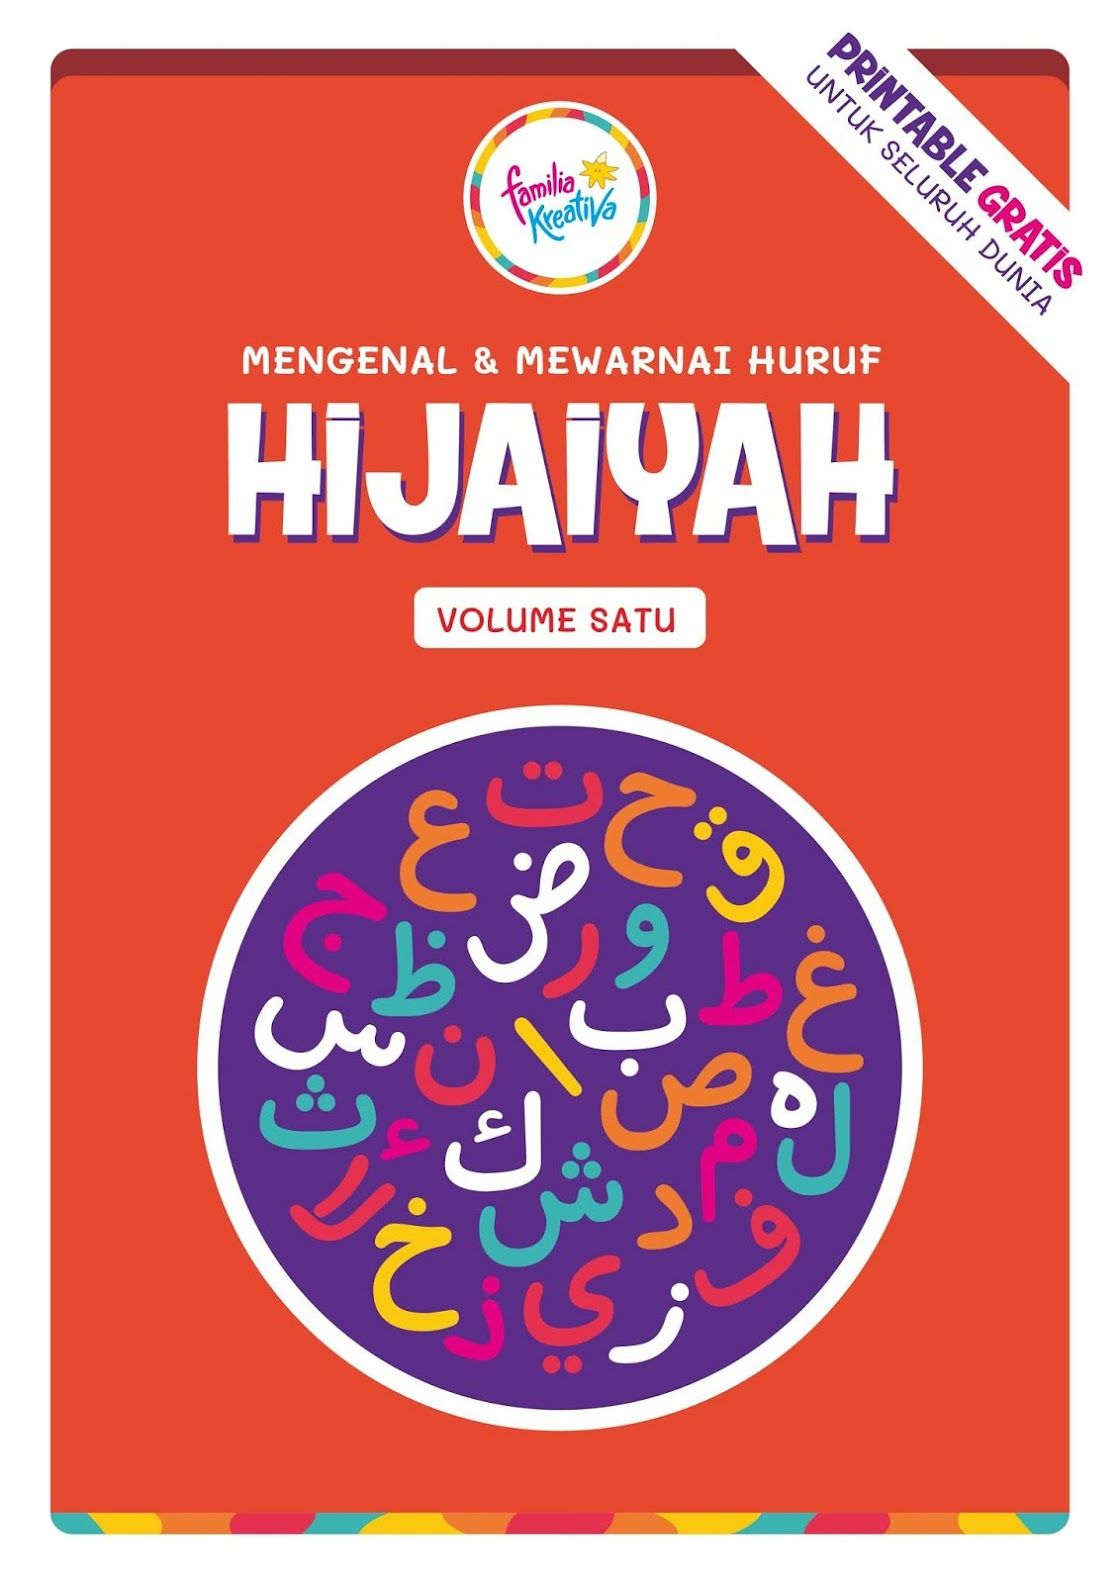 Gratis Printable Favorit Mewarnai Huruf Hijaiyah Vol 1